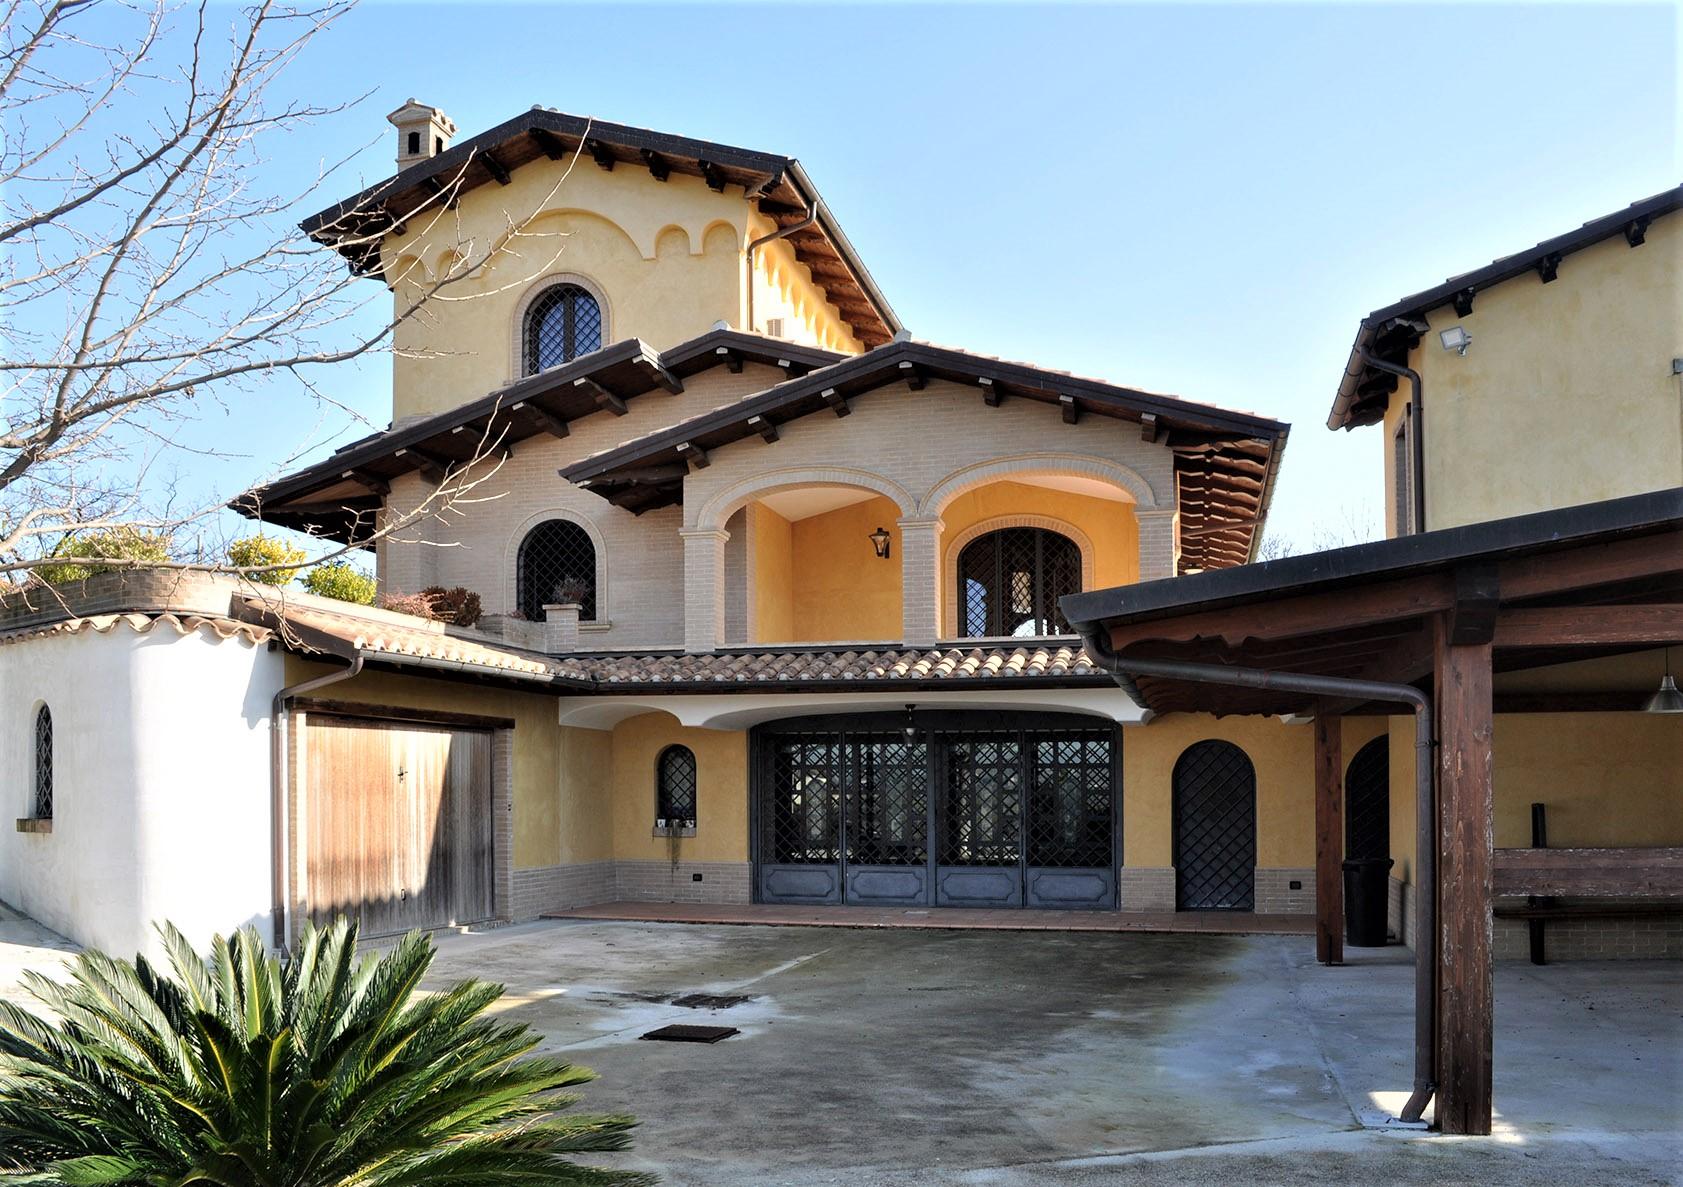 Villa Villa for sale Tortoreto (TE), Villa Bianca - Tortoreto - EUR 770.233 370